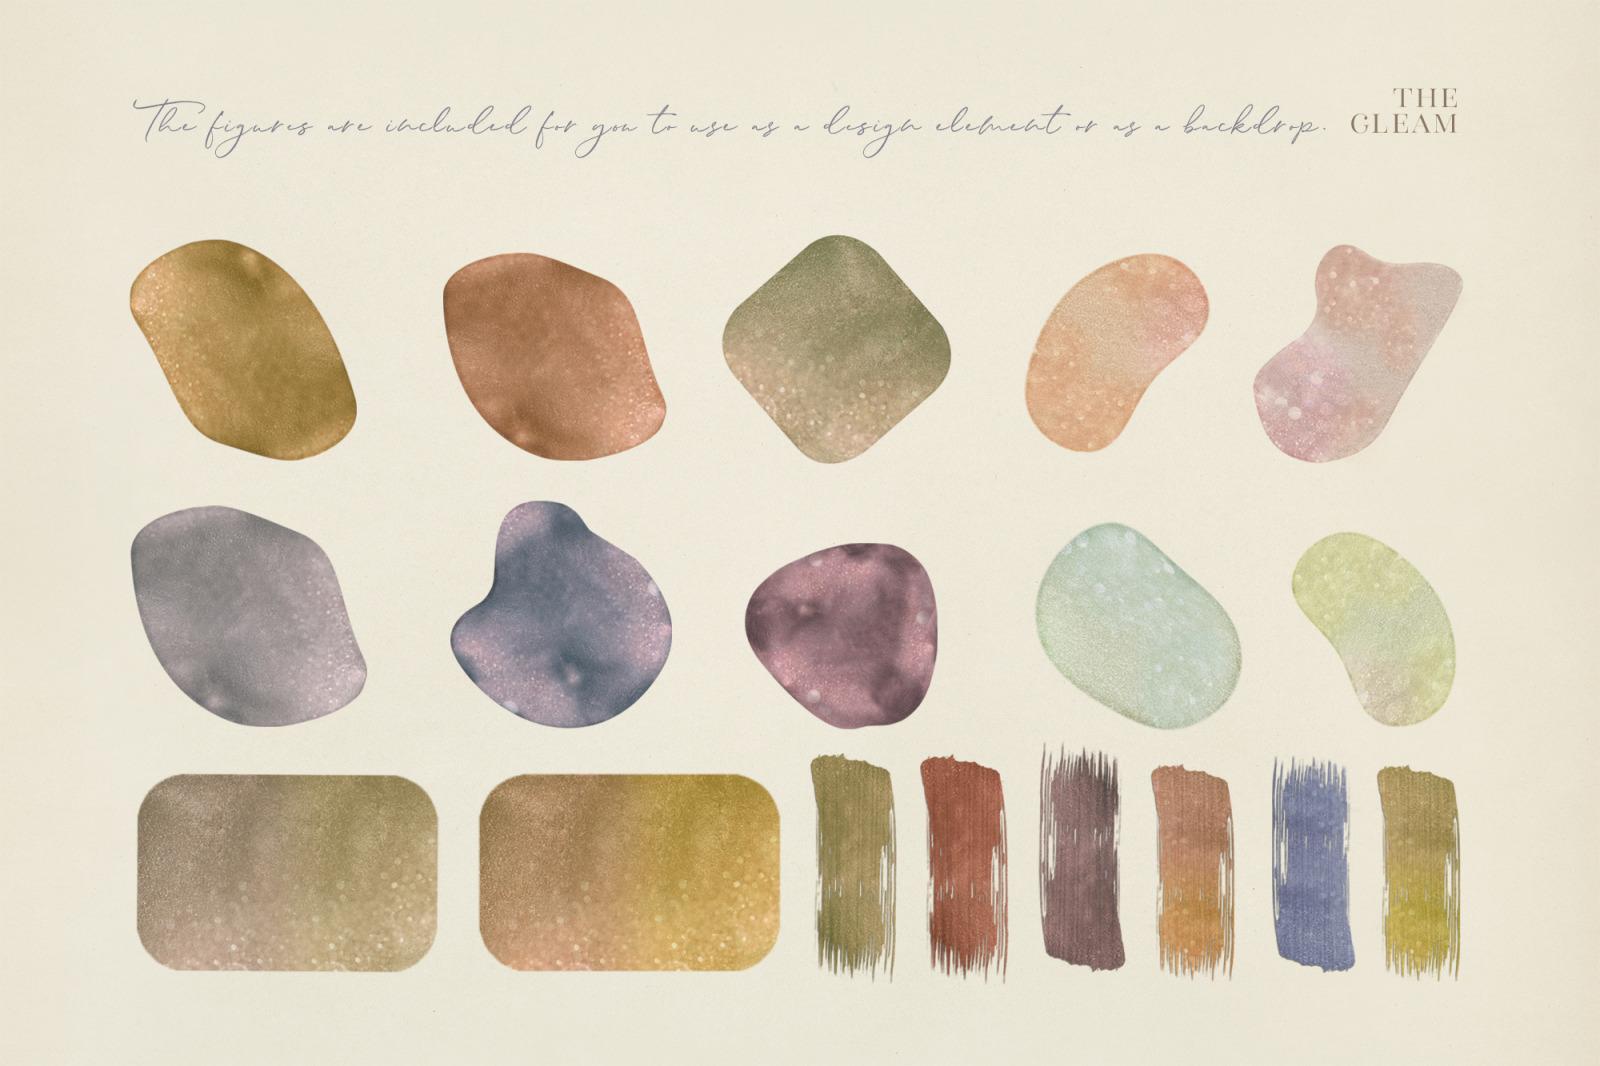 抽象闪闪发光水彩背景图片设计素材 The Gleam Watercolor Shapes插图11